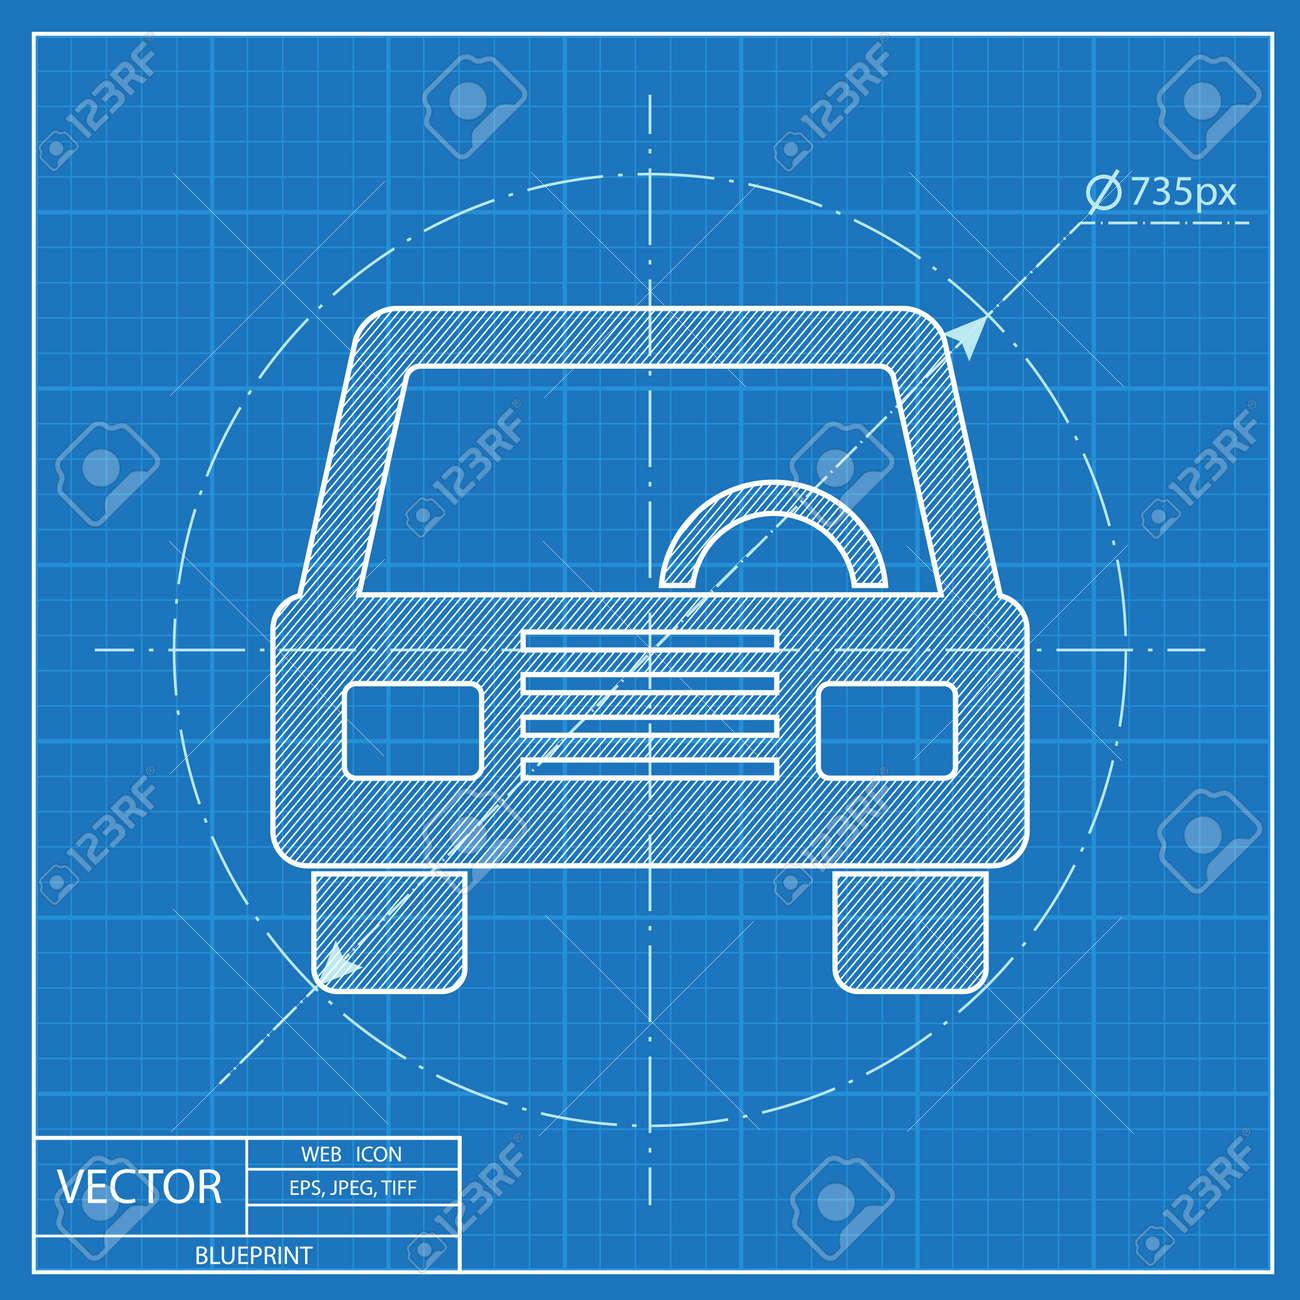 Magnificent blueprint value car gallery electrical circuit amazing blueprint value car images electrical circuit diagram malvernweather Image collections